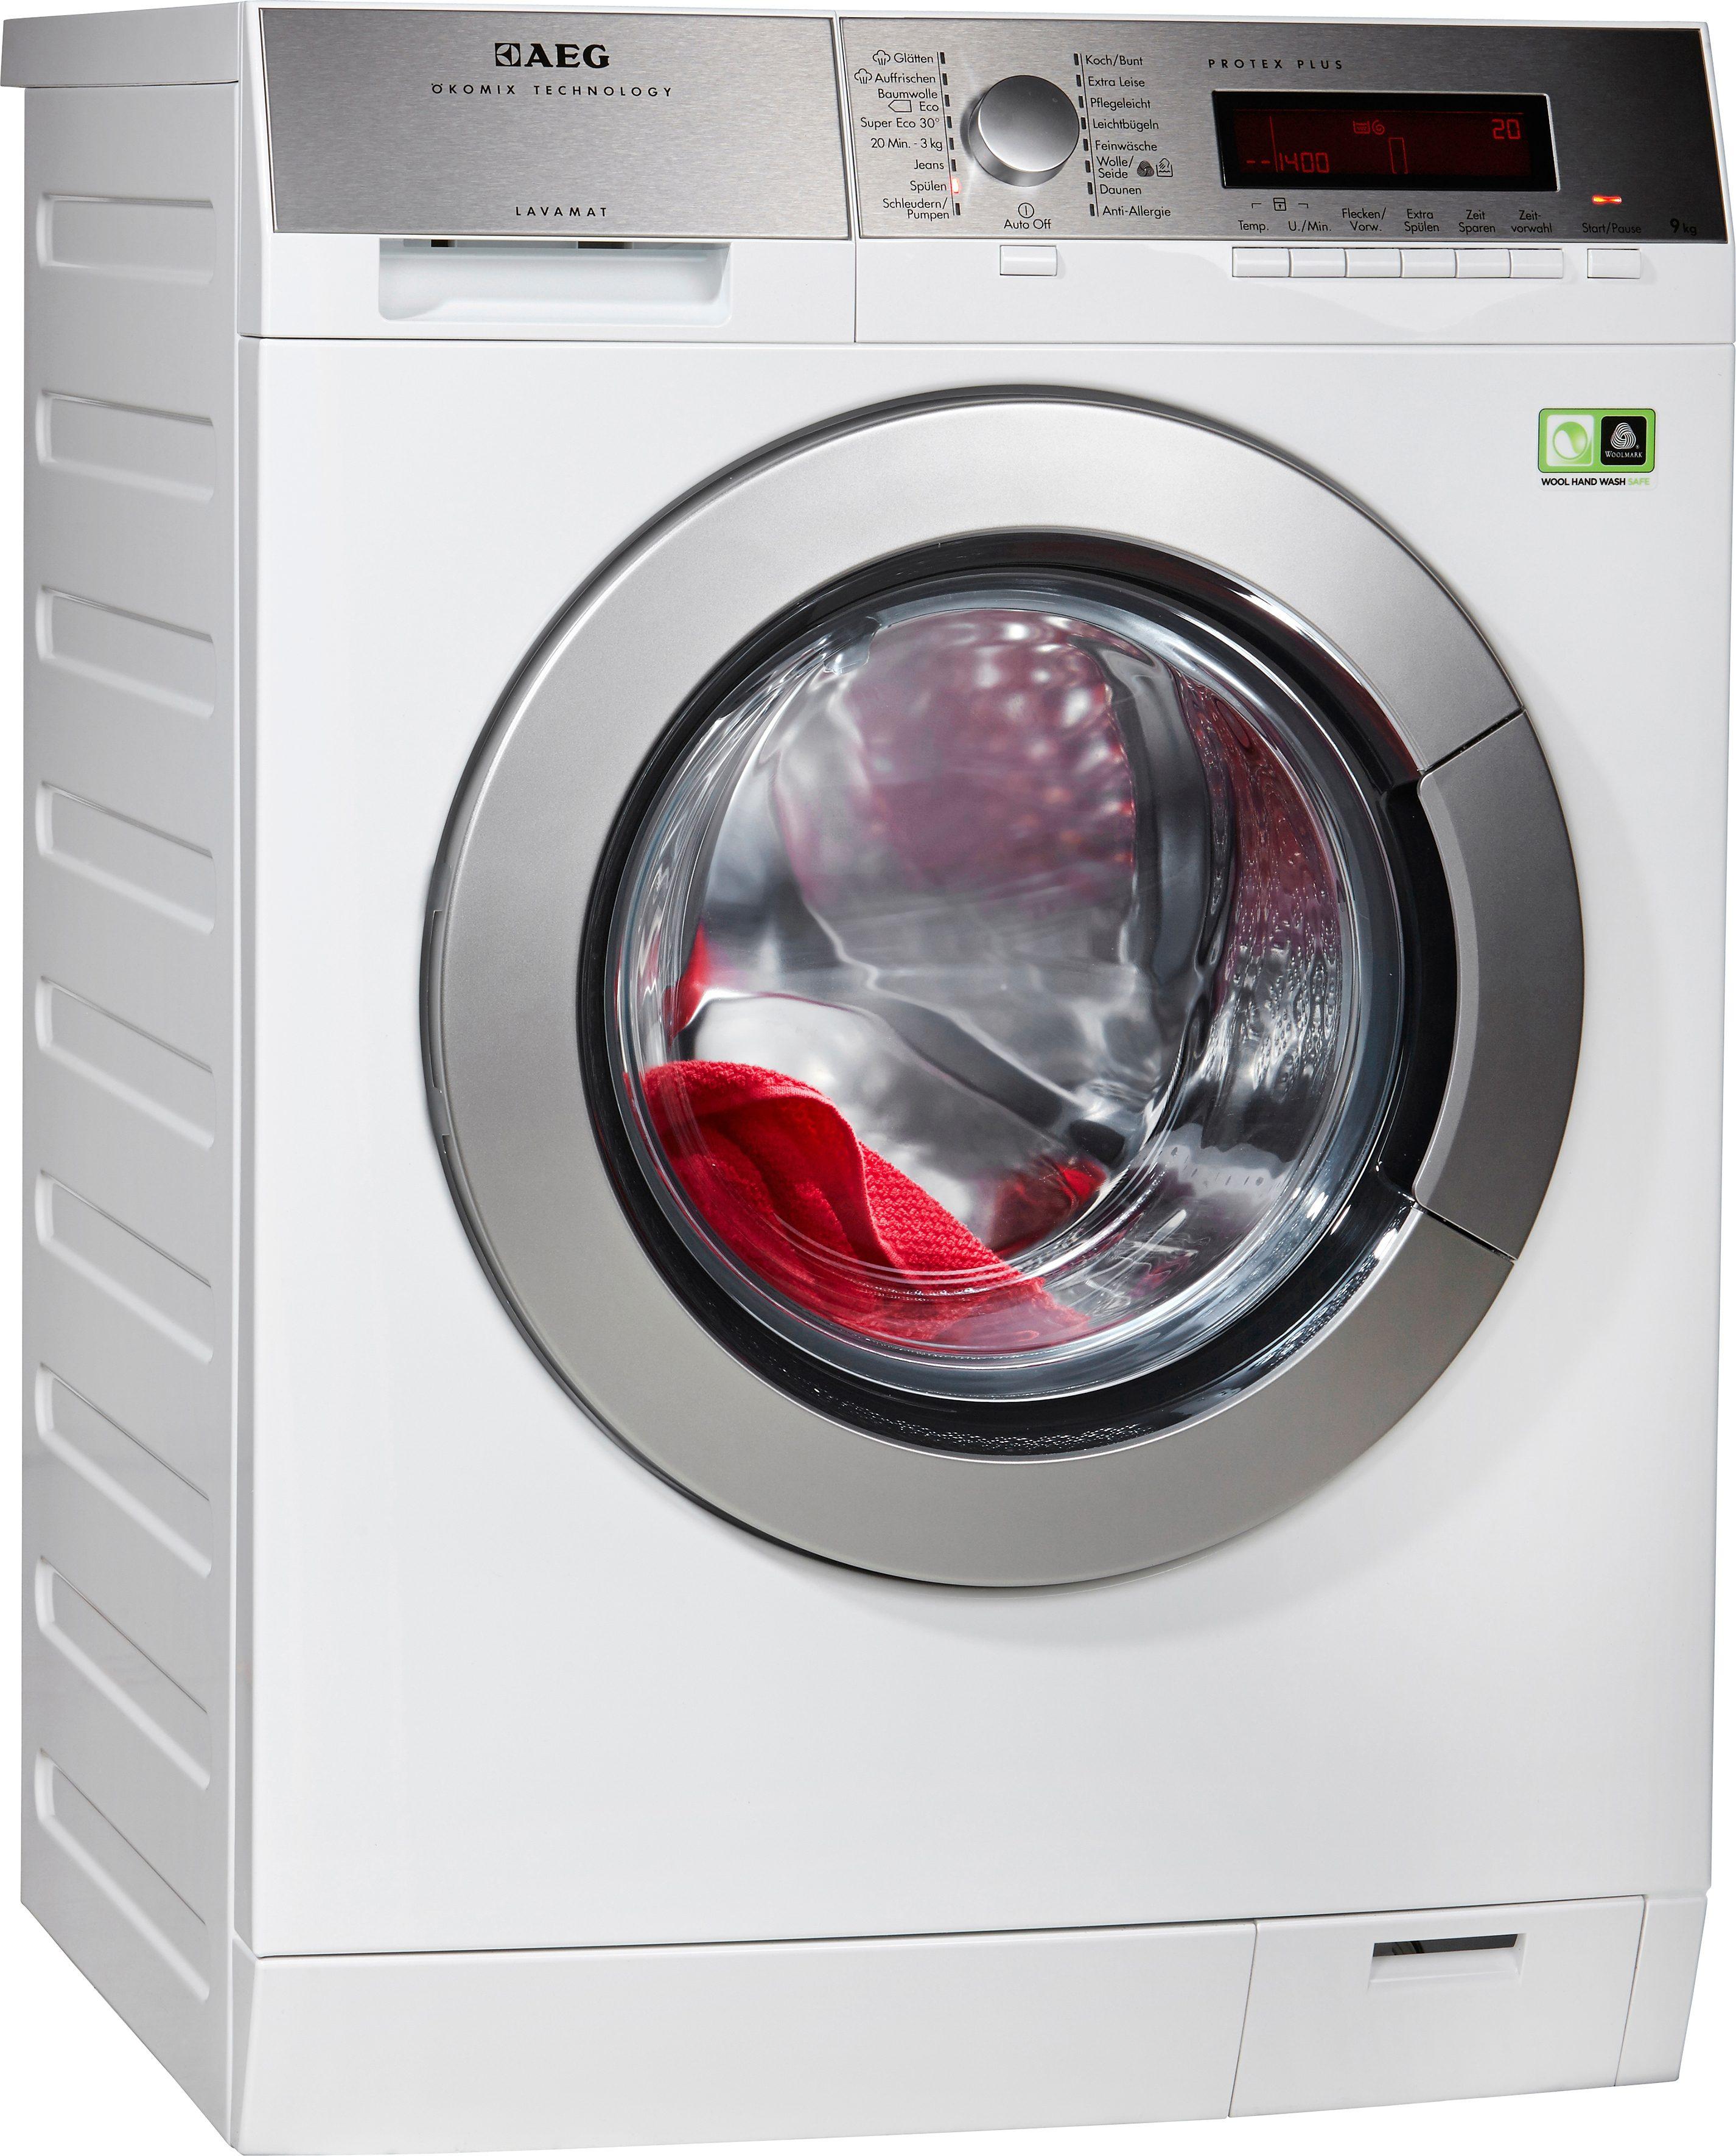 AEG Waschmaschine Lavamat L89495FL2, A+++, 9 kg, 1400 U/Min